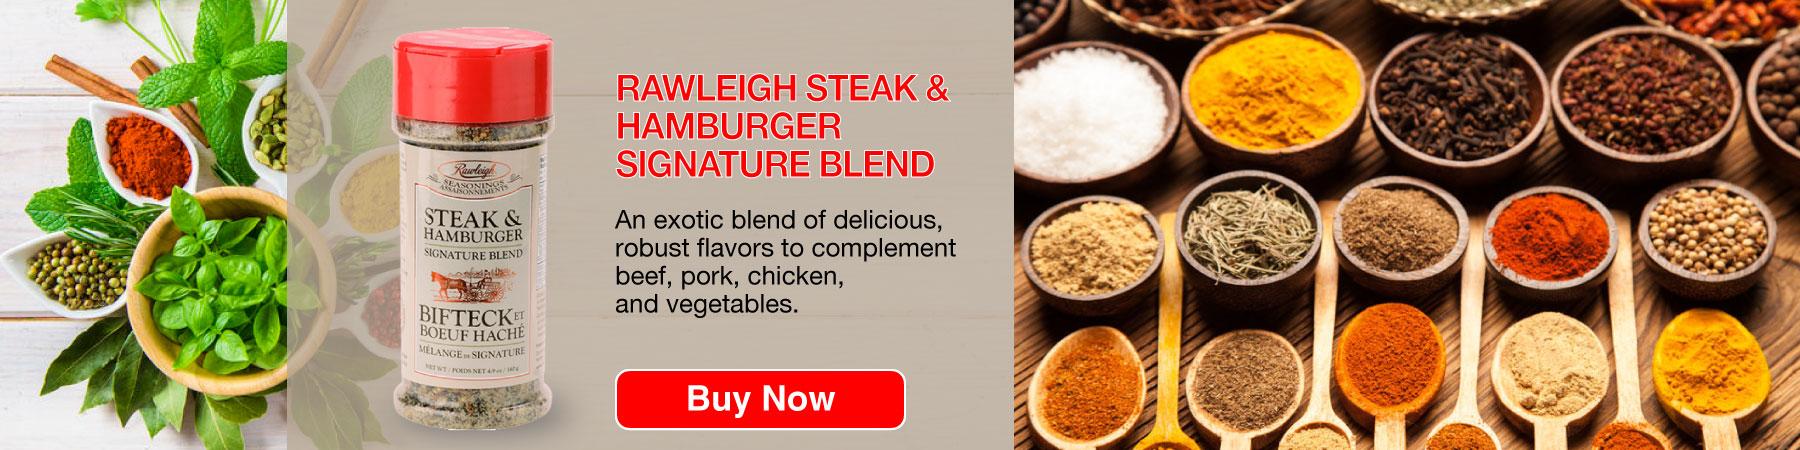 Steak & Hamburger Signature Blend